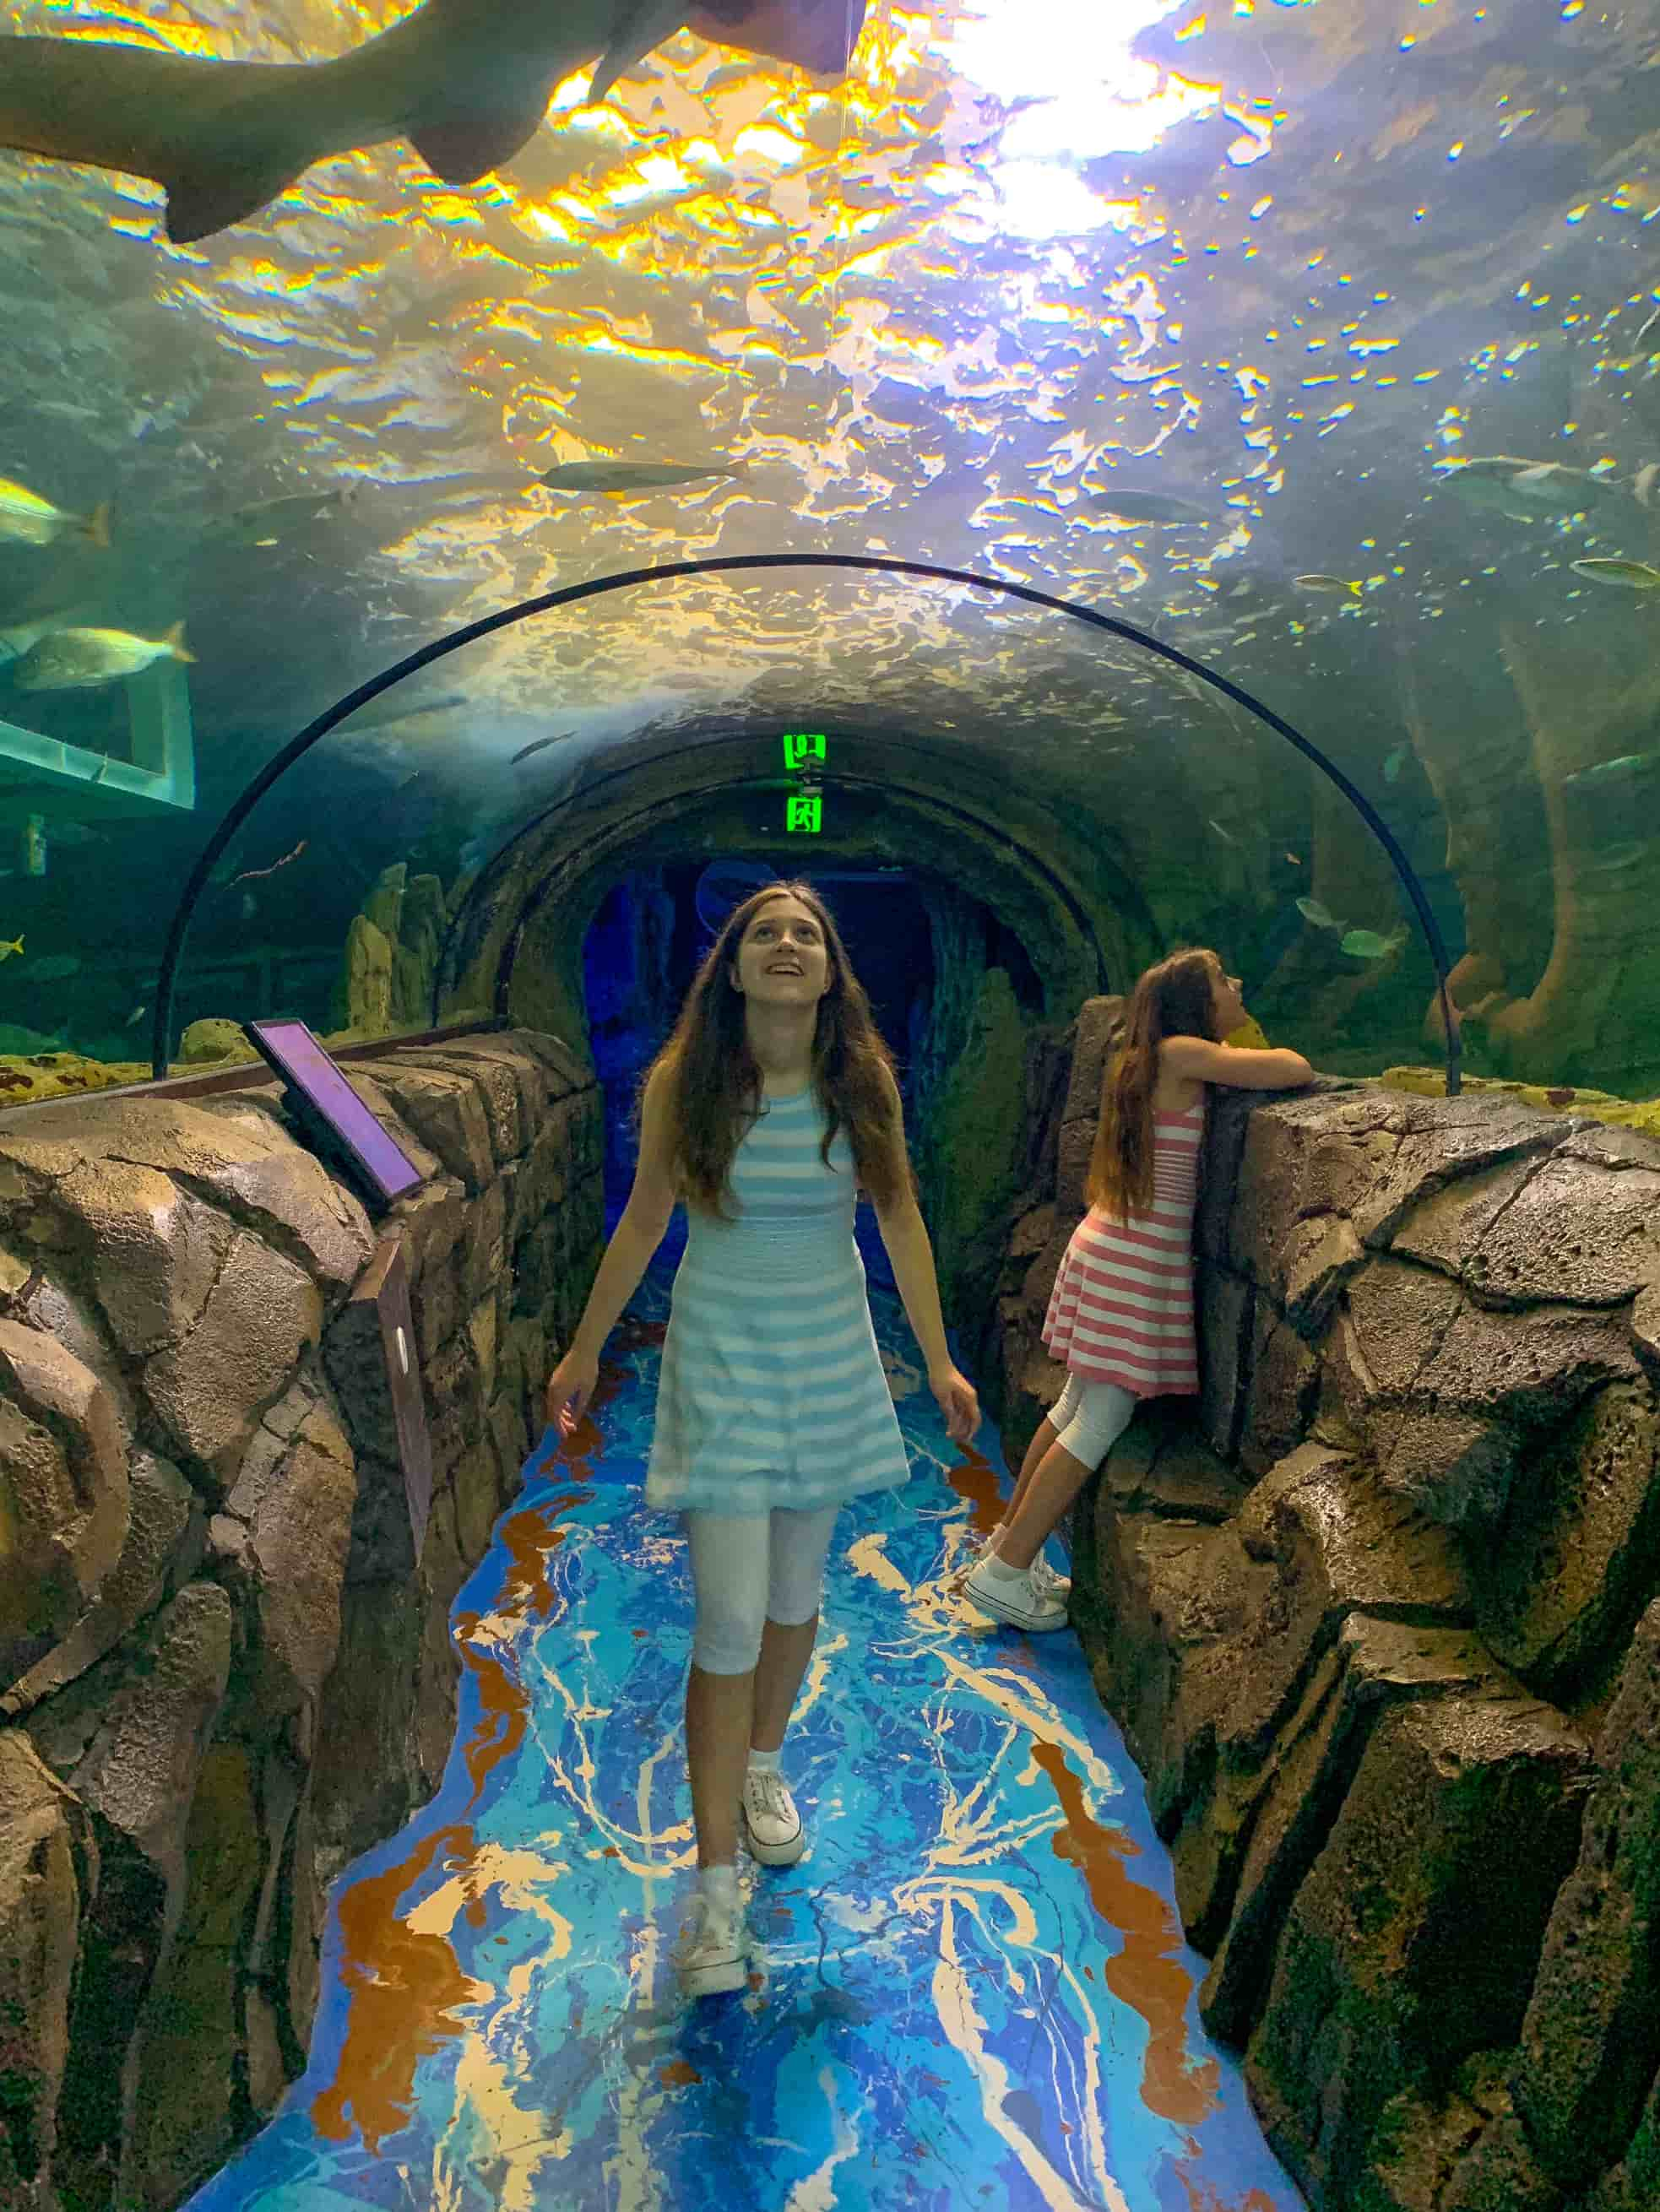 Sydney Aquarium glass tunnels